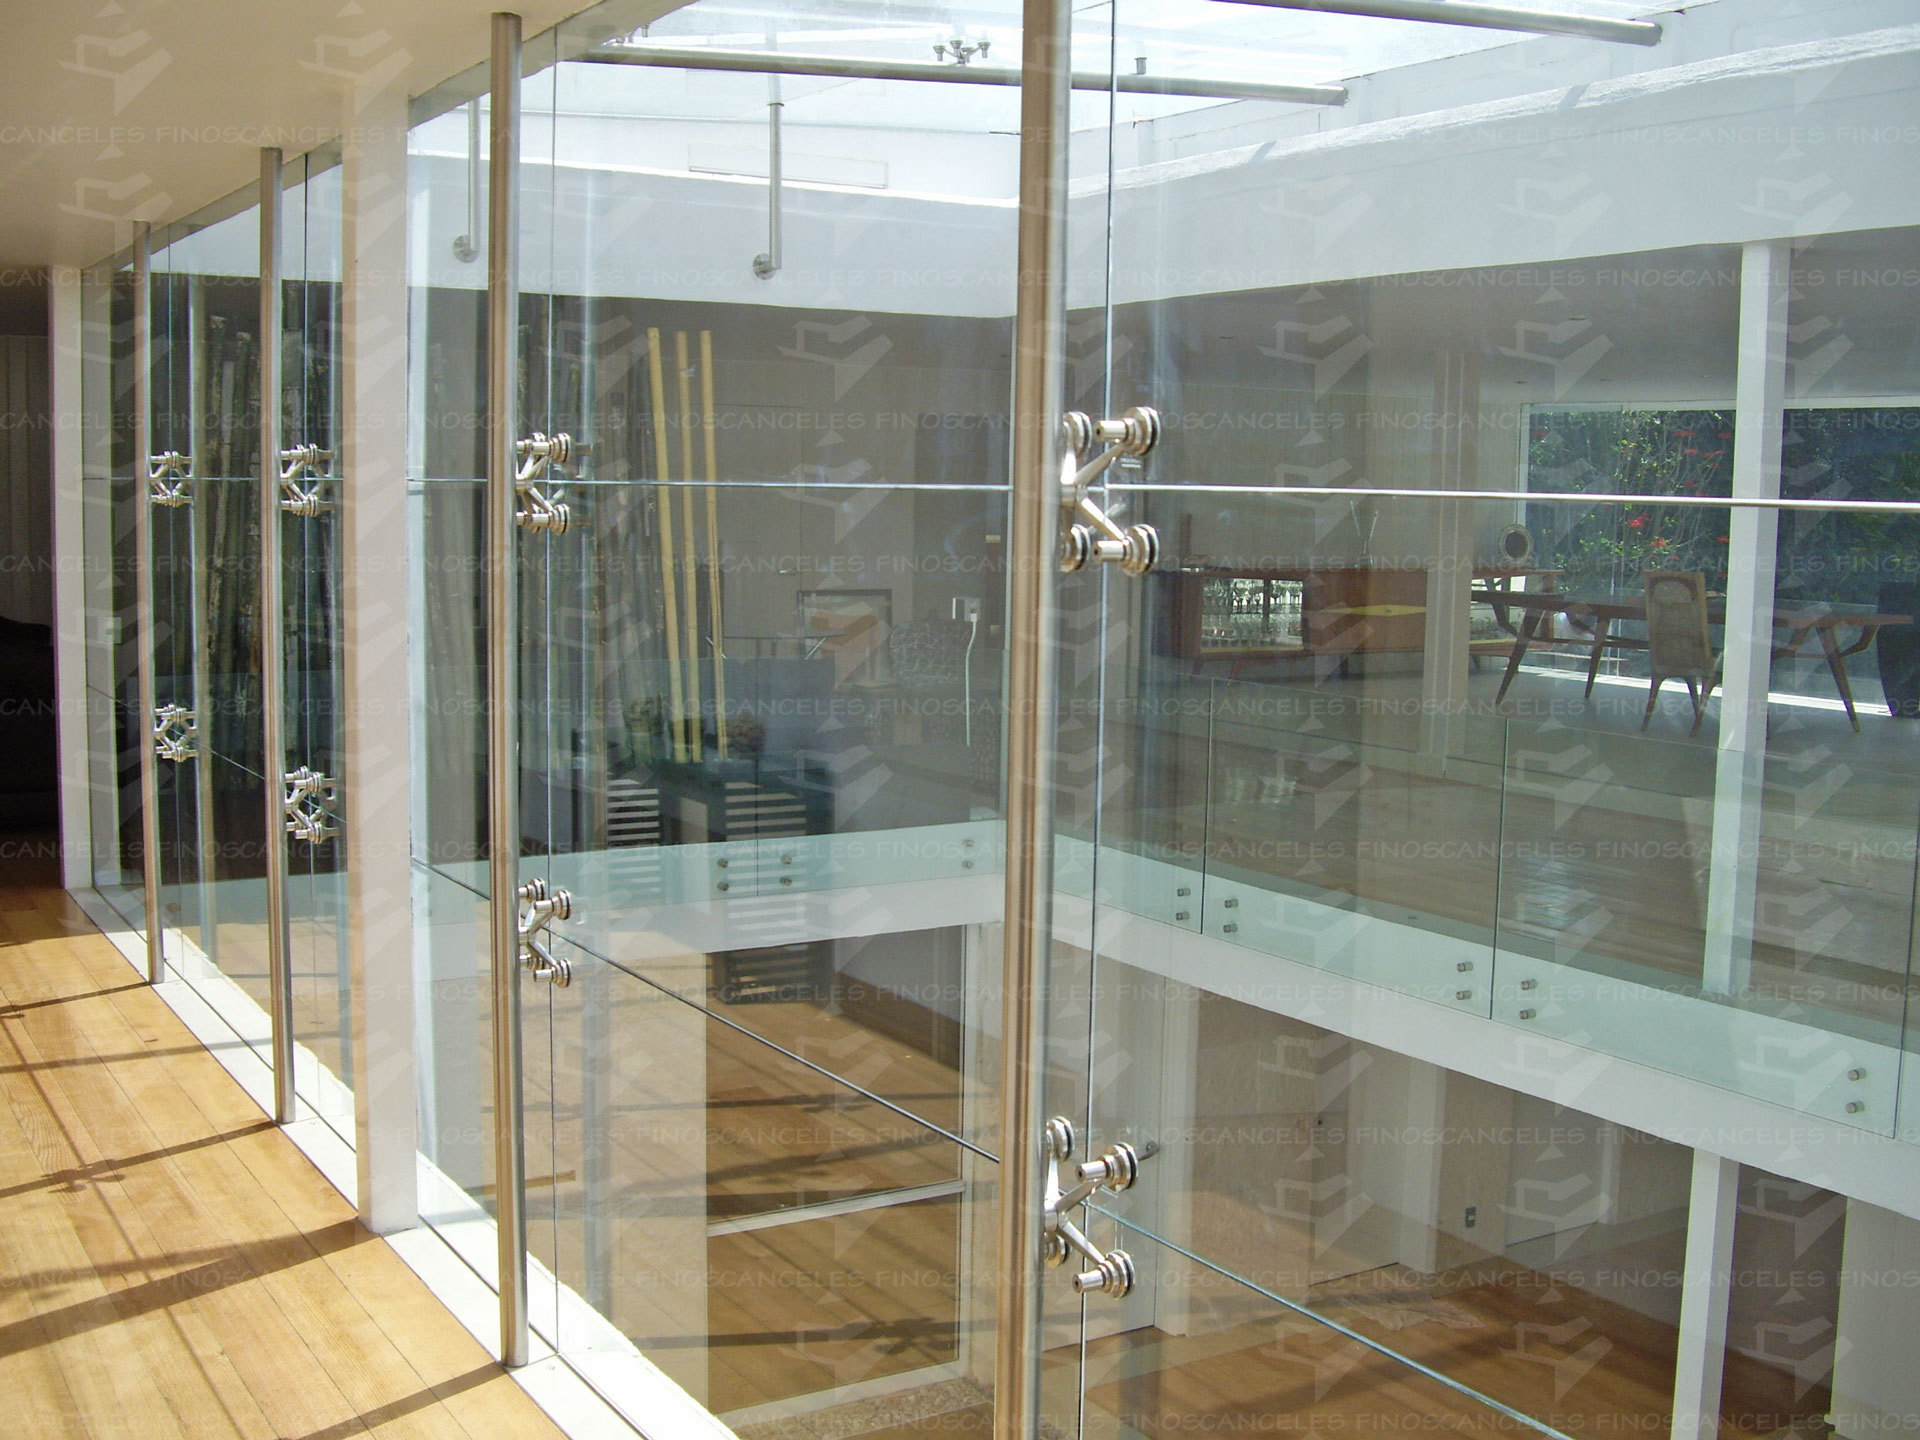 Mamparas de vidrio  Vidrieria Corporacion VC